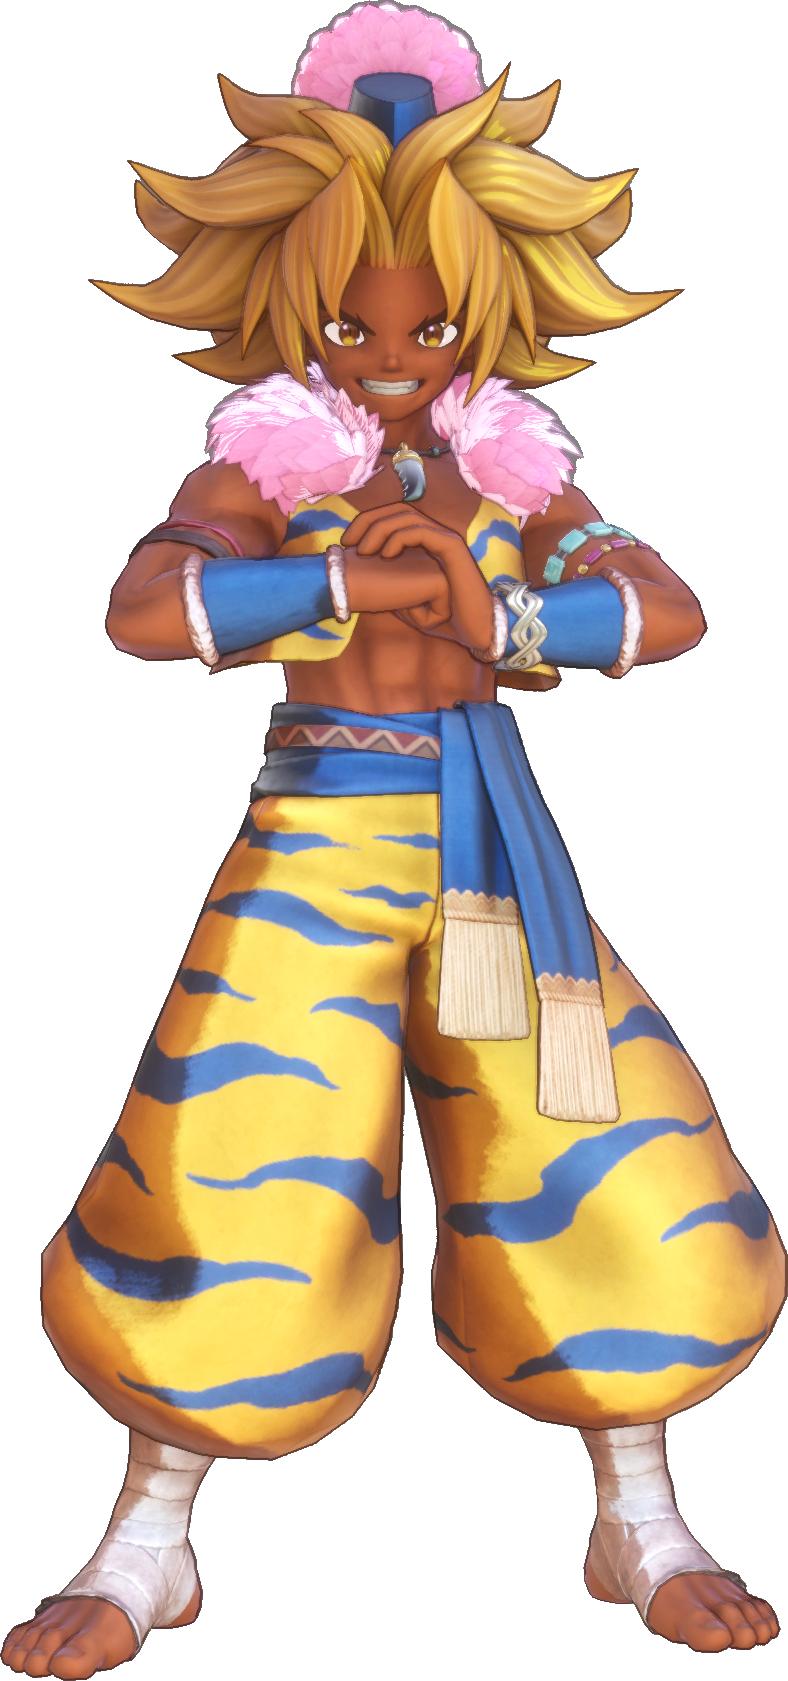 Grappler (Trials of Mana)